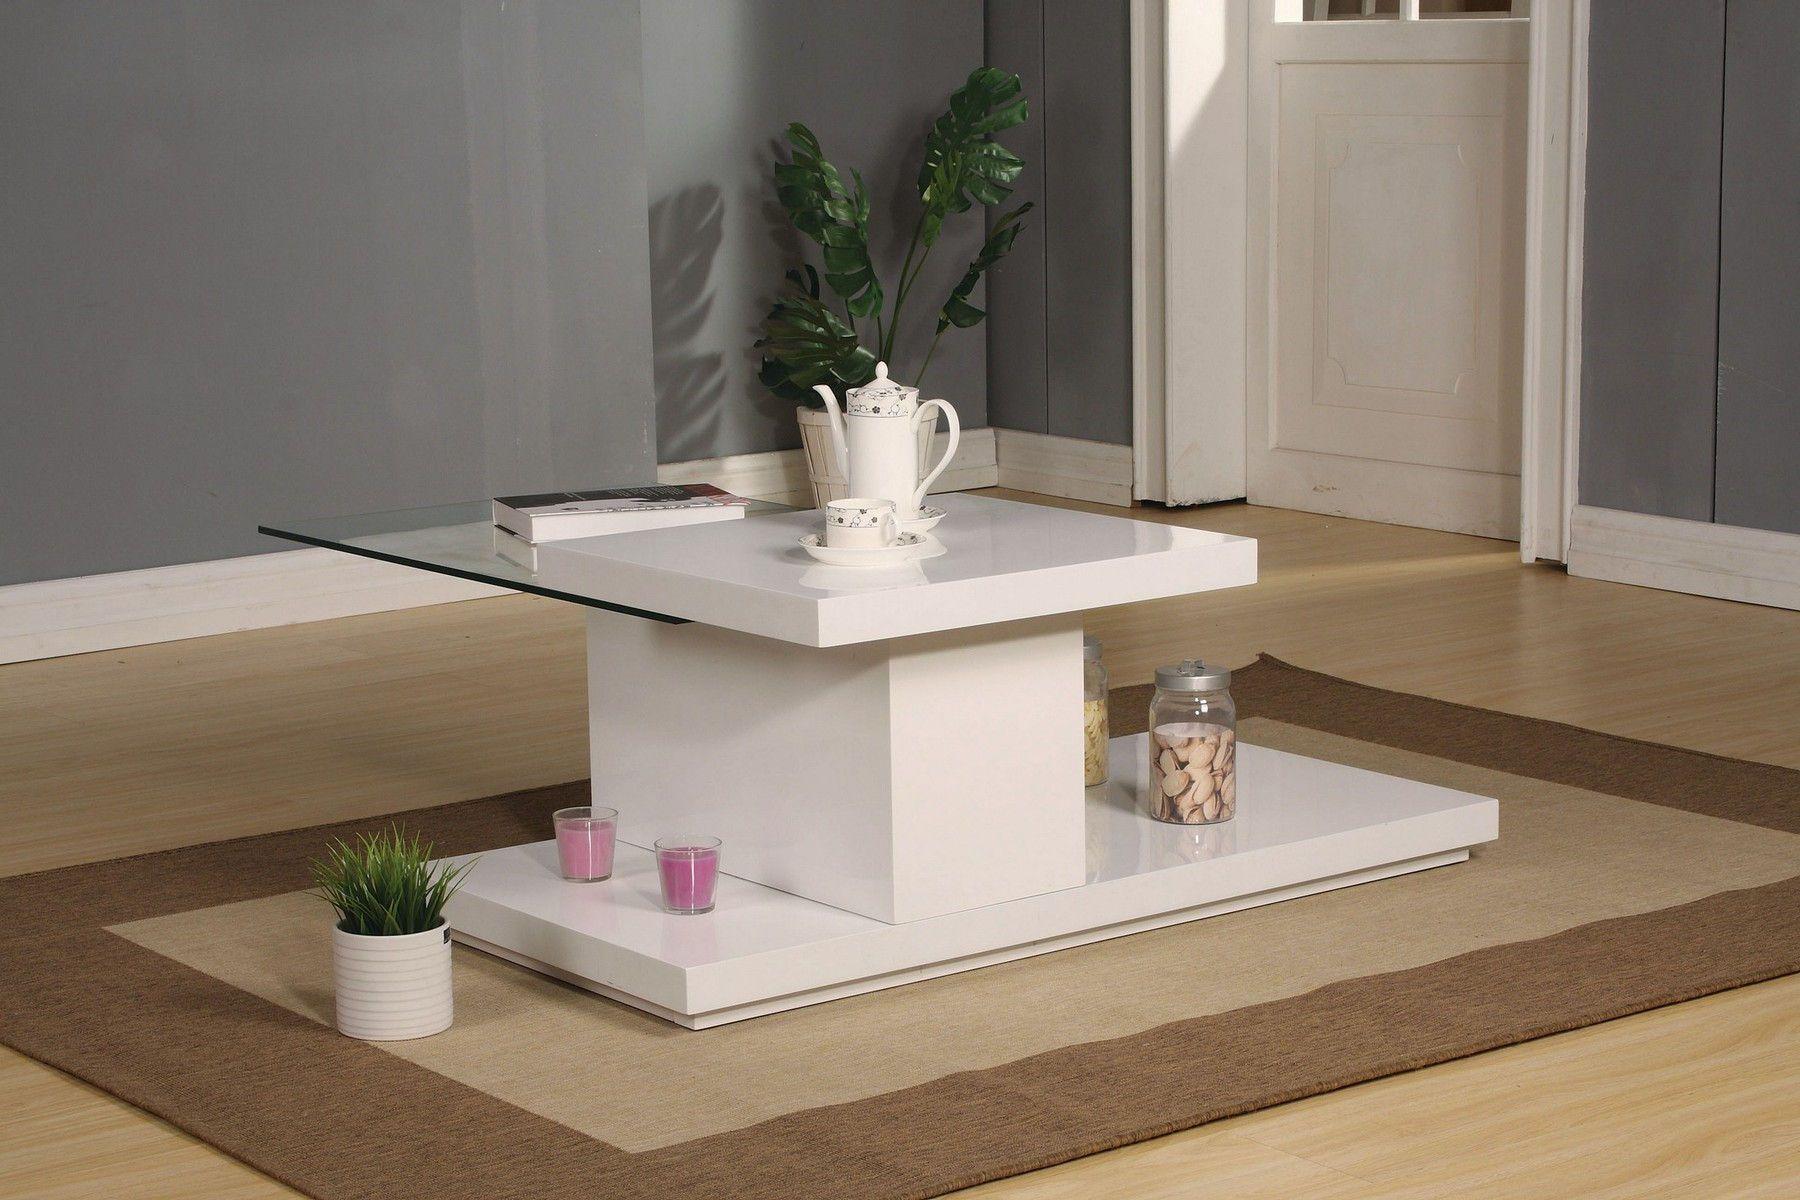 Marla Coffee Table 80805 Acme Corporation Coffee Tables In 2021 Coffee Table Coffee Table White Table [ 1200 x 1800 Pixel ]